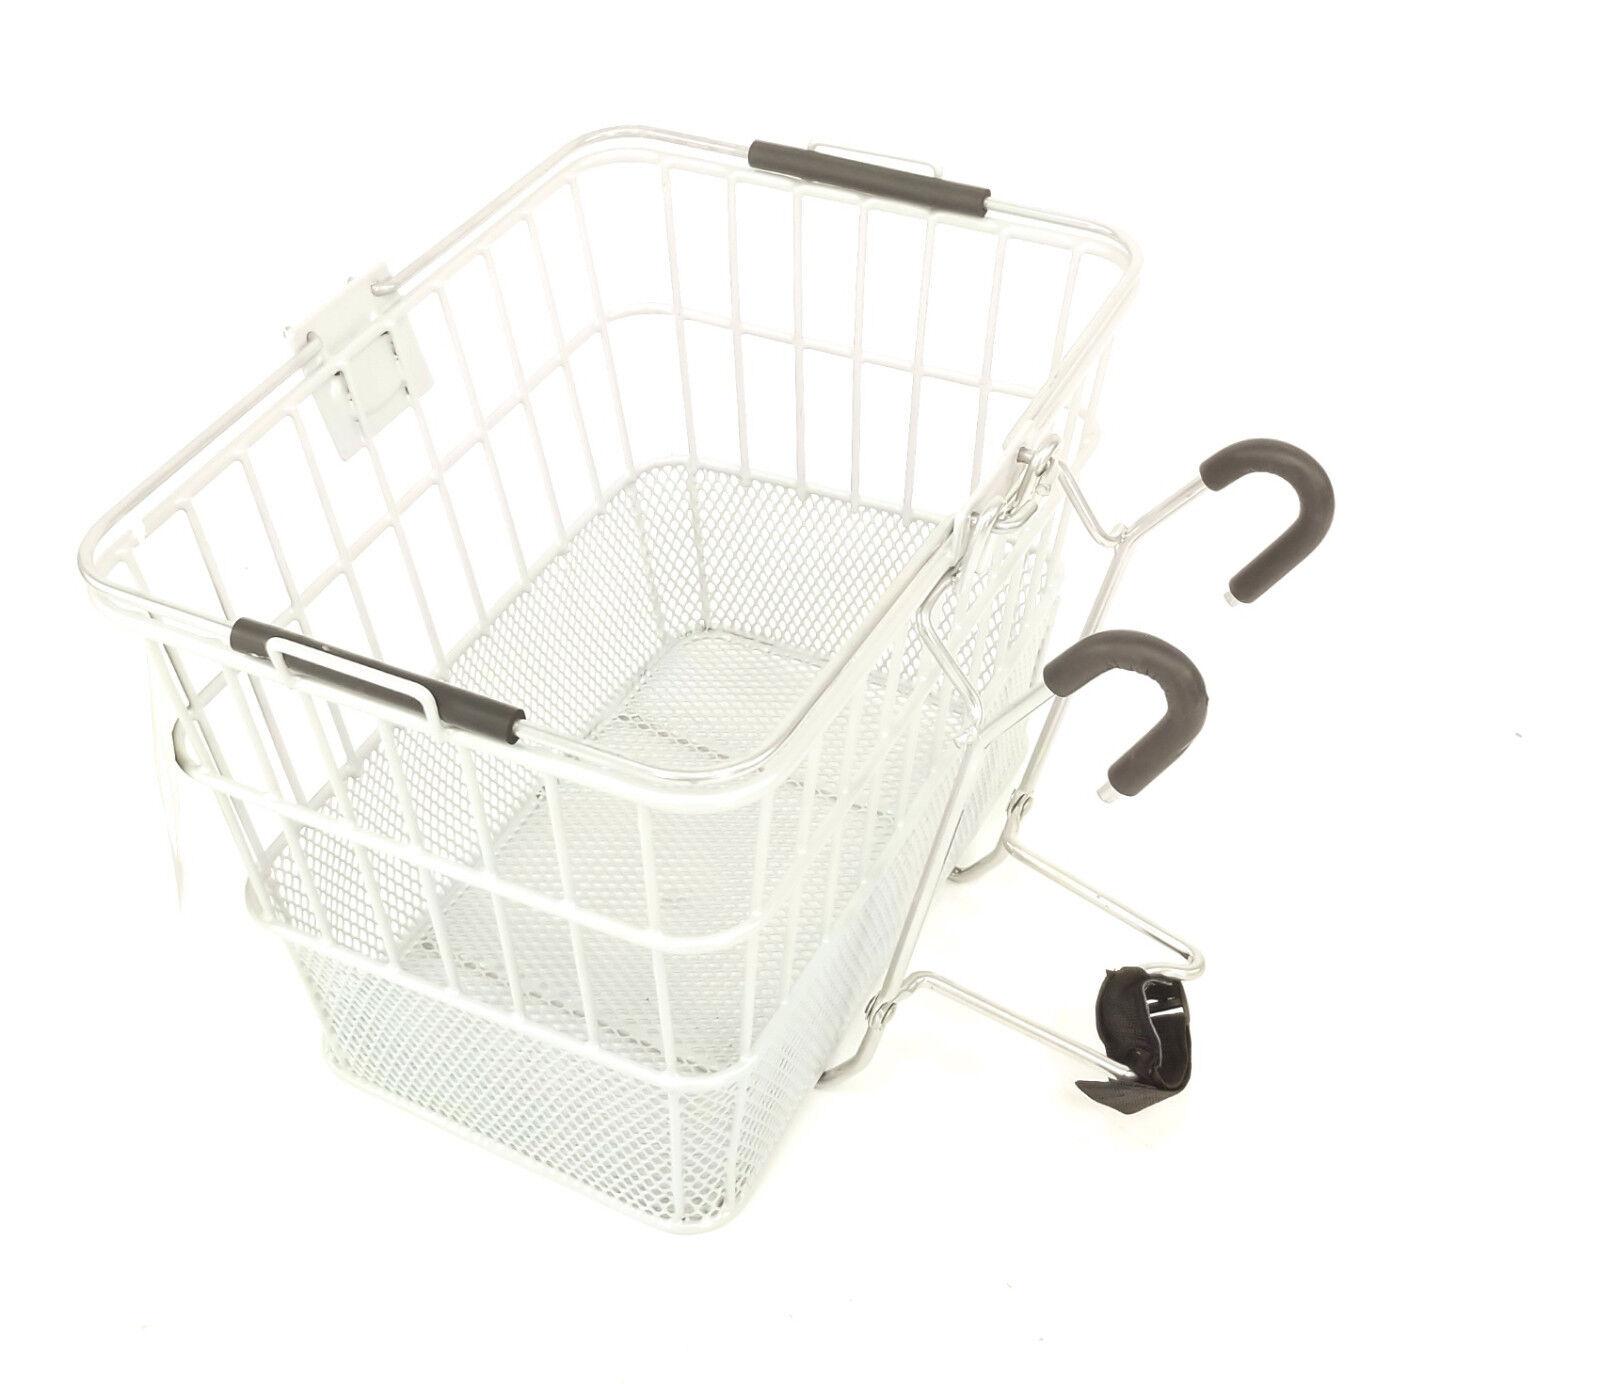 Ultracycle Hook & Go Mesh Bicycle Basket, White   floor price